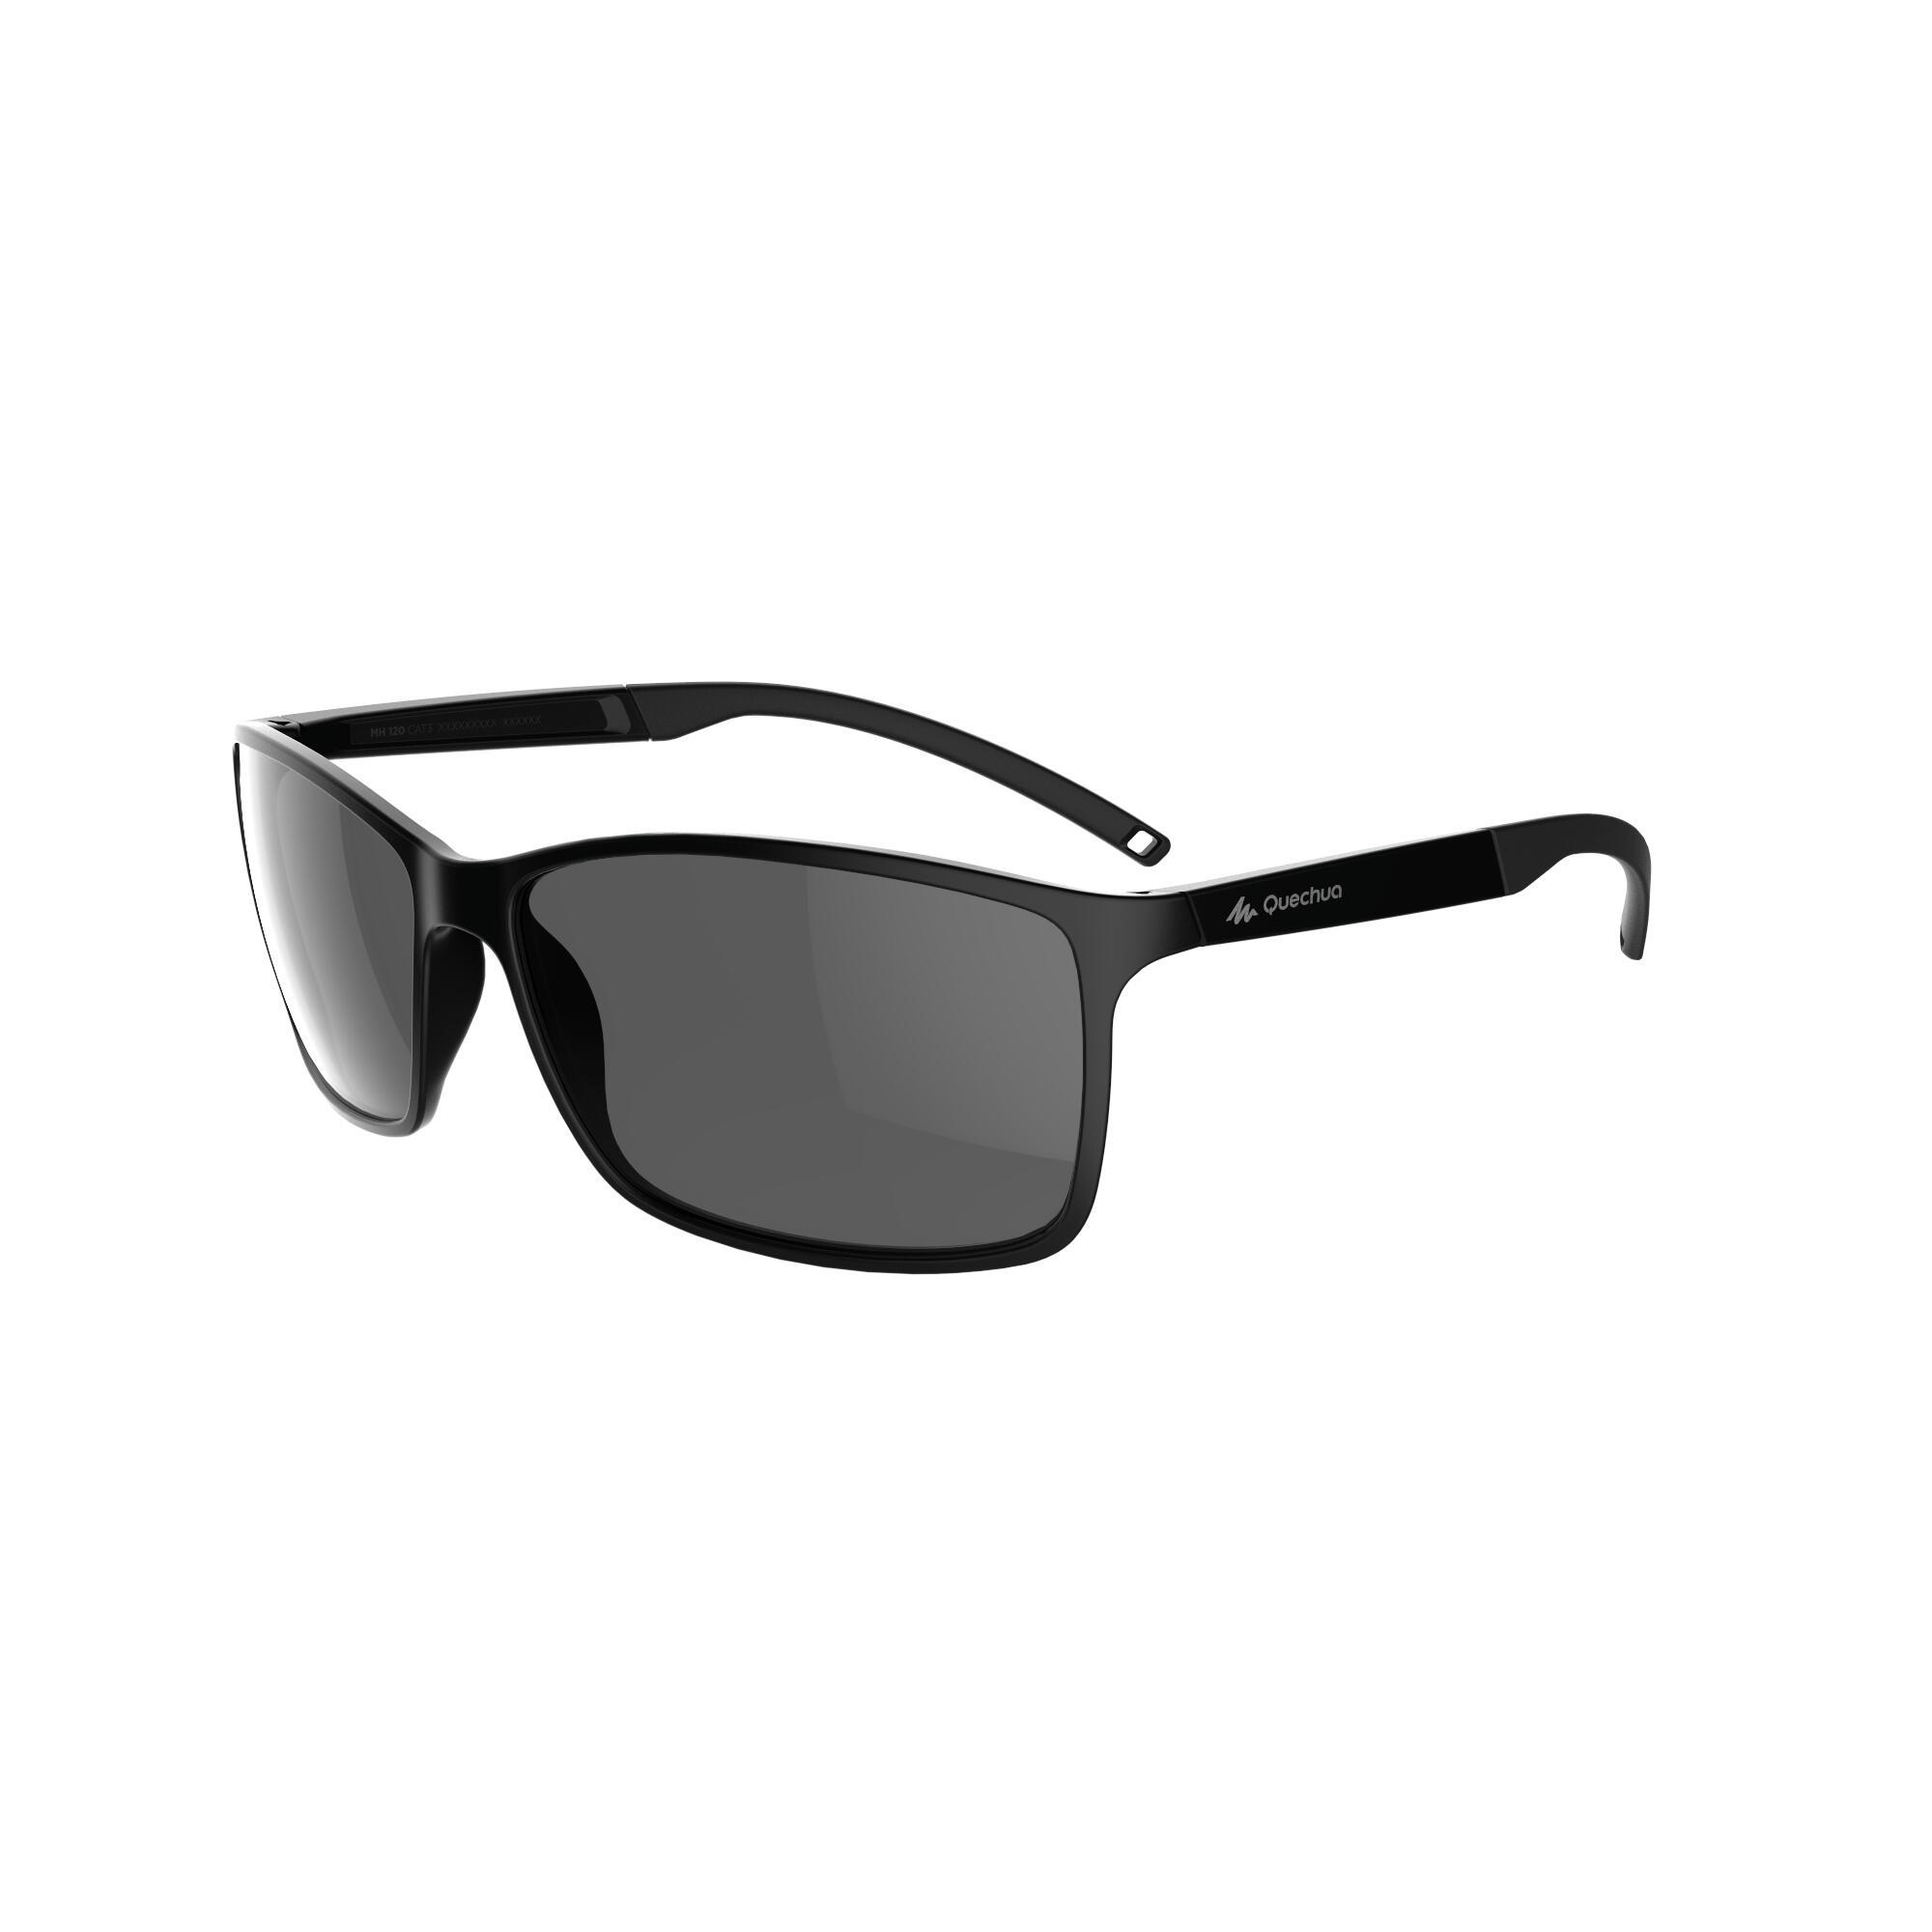 Sonnenbrille MH120 Kategorie3 Erwachsene   Accessoires > Sonnenbrillen   Quechua